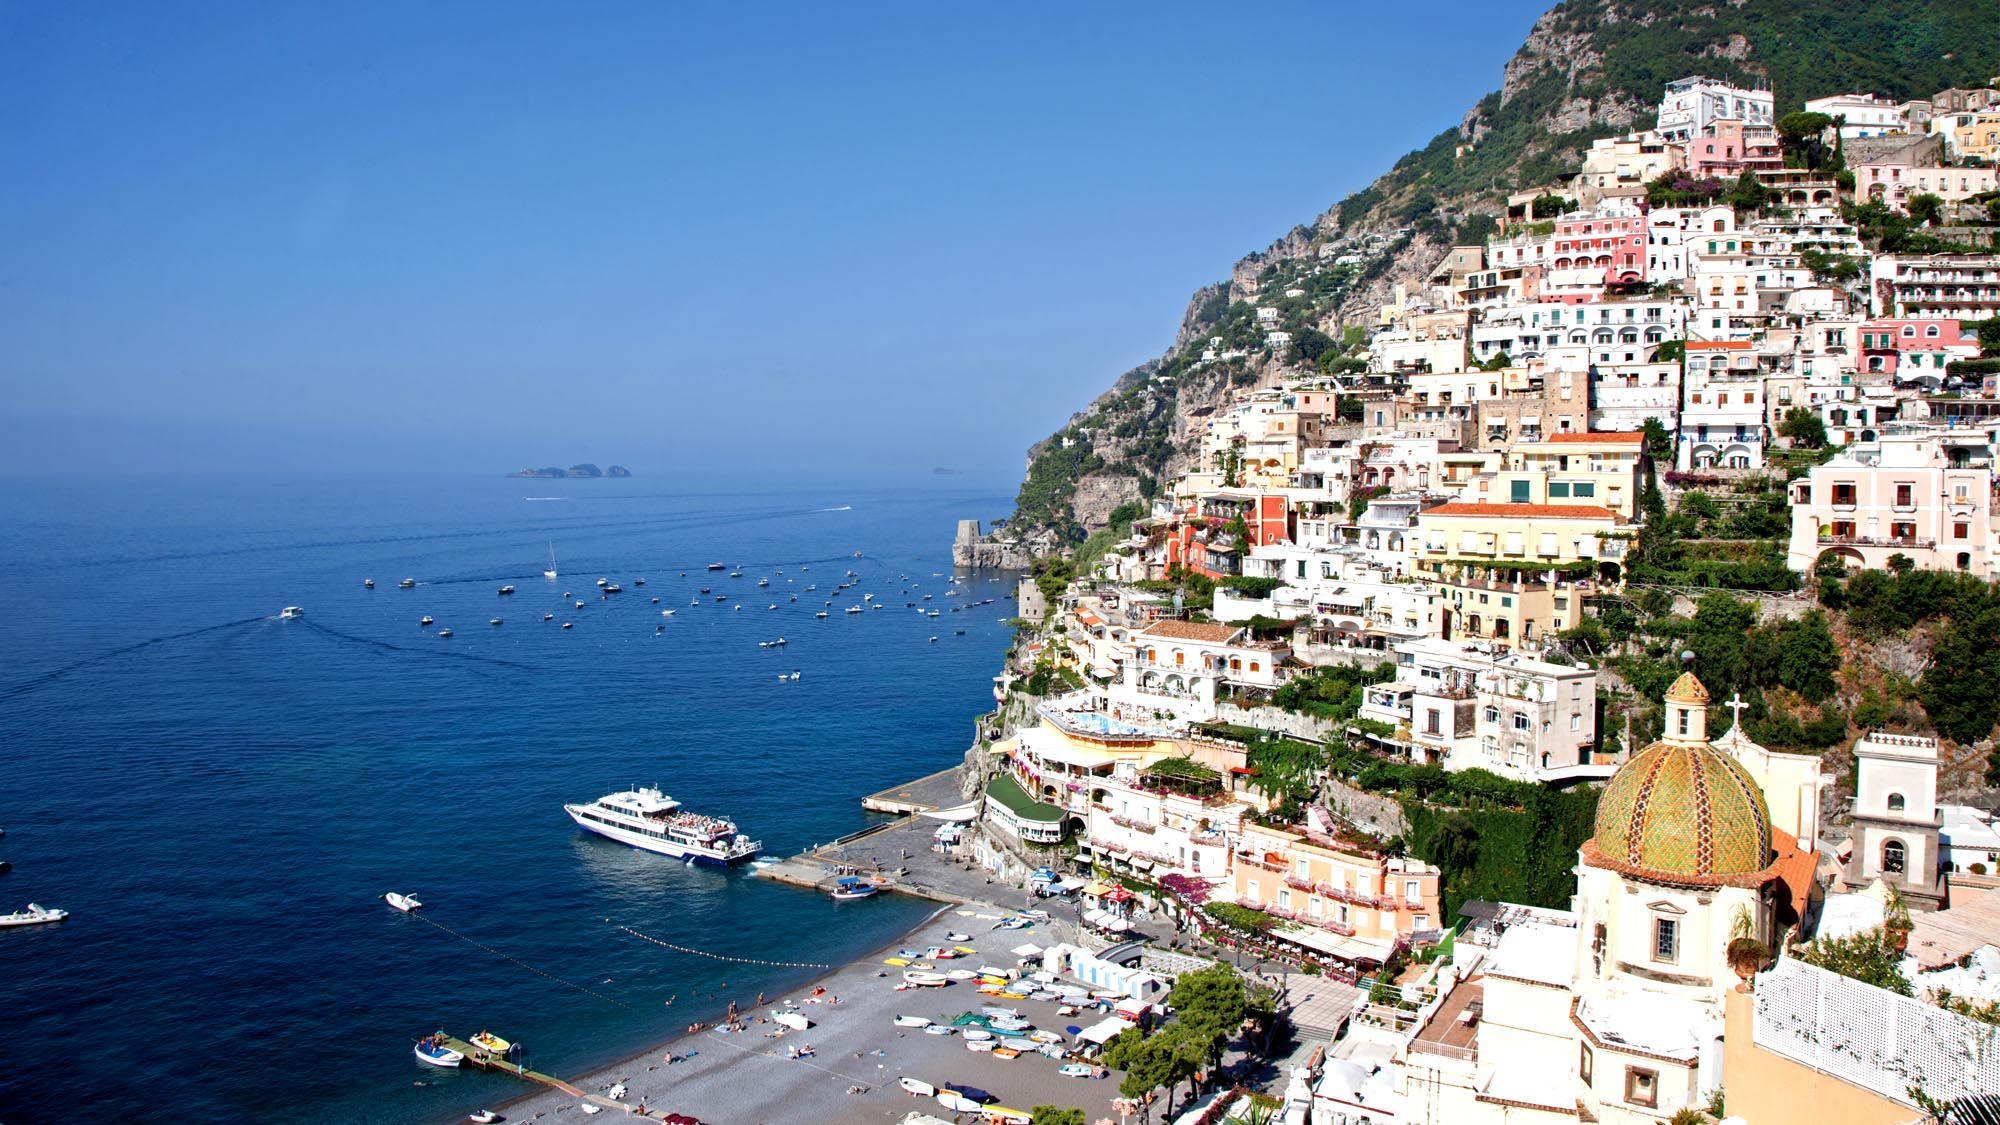 Hotel In Positano Italy Beach 5